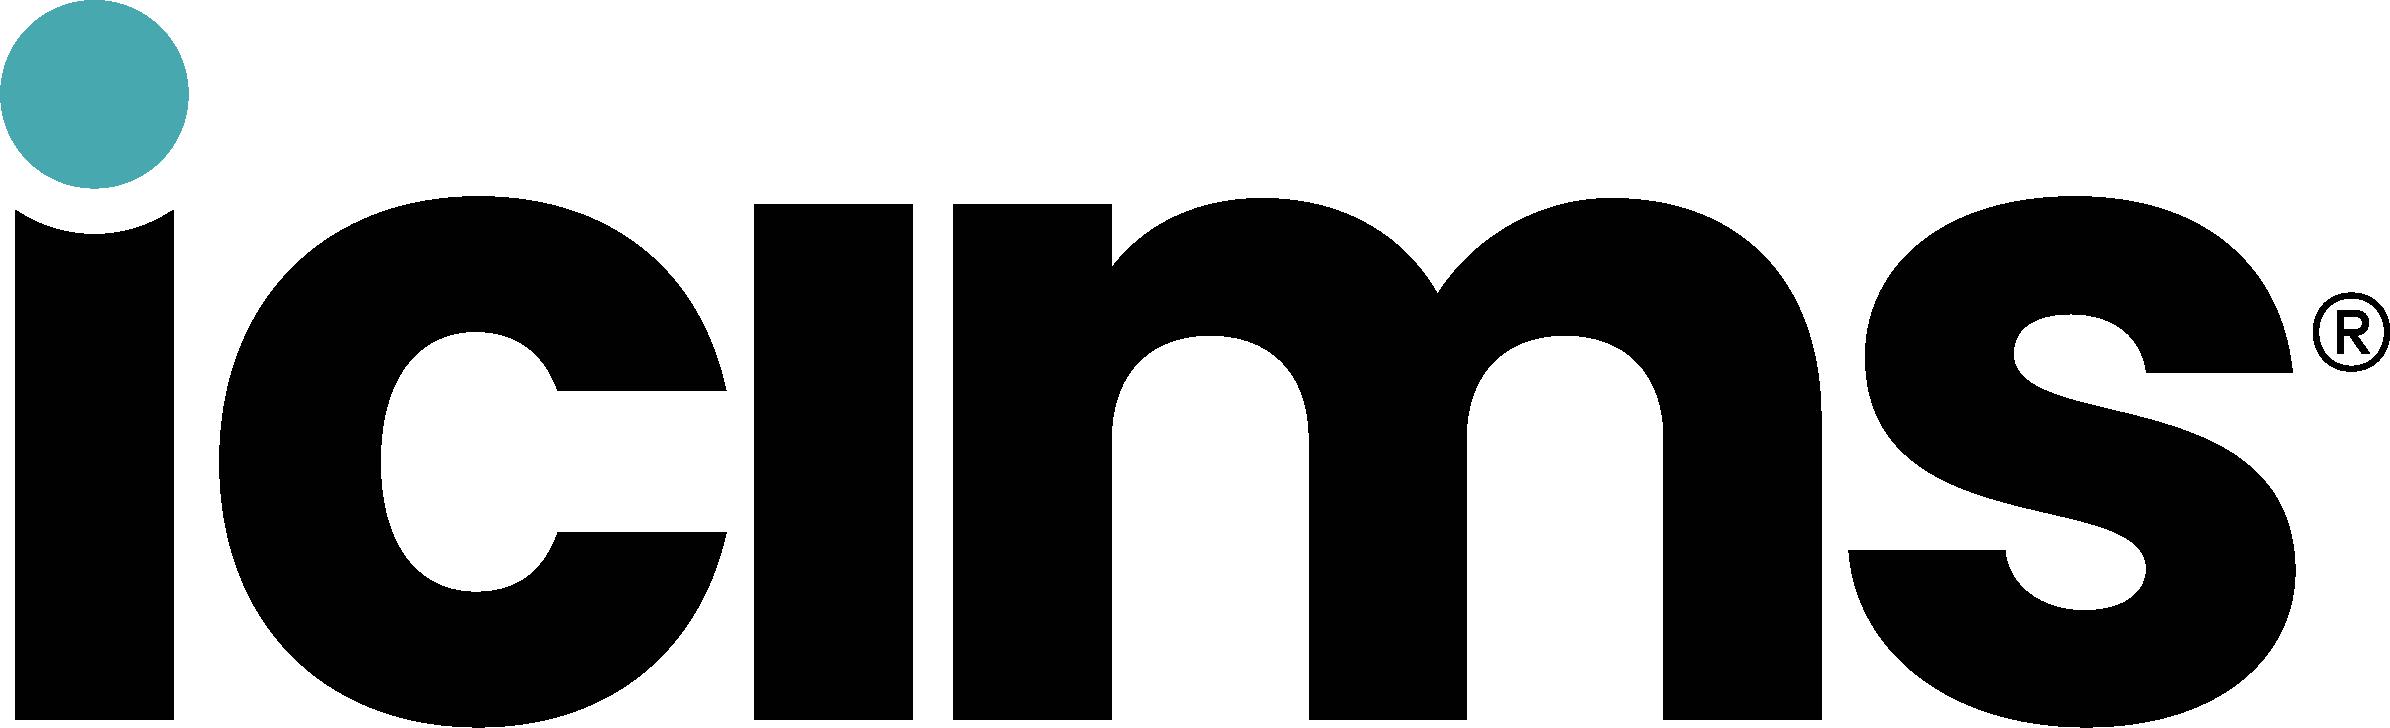 iCIMS Talent Cloud logo